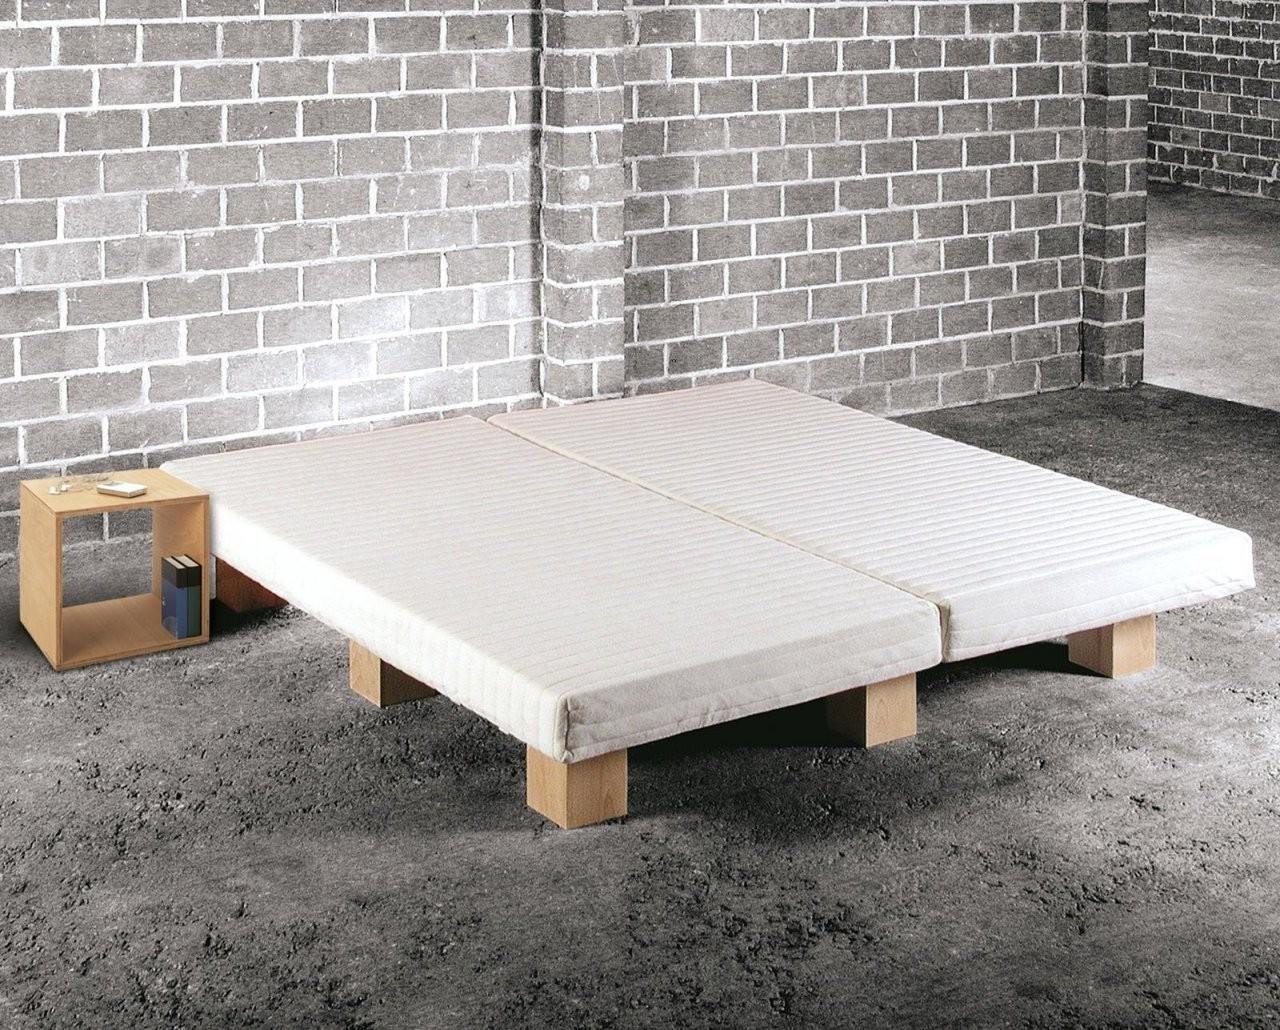 Ausziehbares Doppelbett Beautiful Bilder 100 Podest Mit Ausziehbarem von Ausziehbares Bett Gleiche Höhe Bild